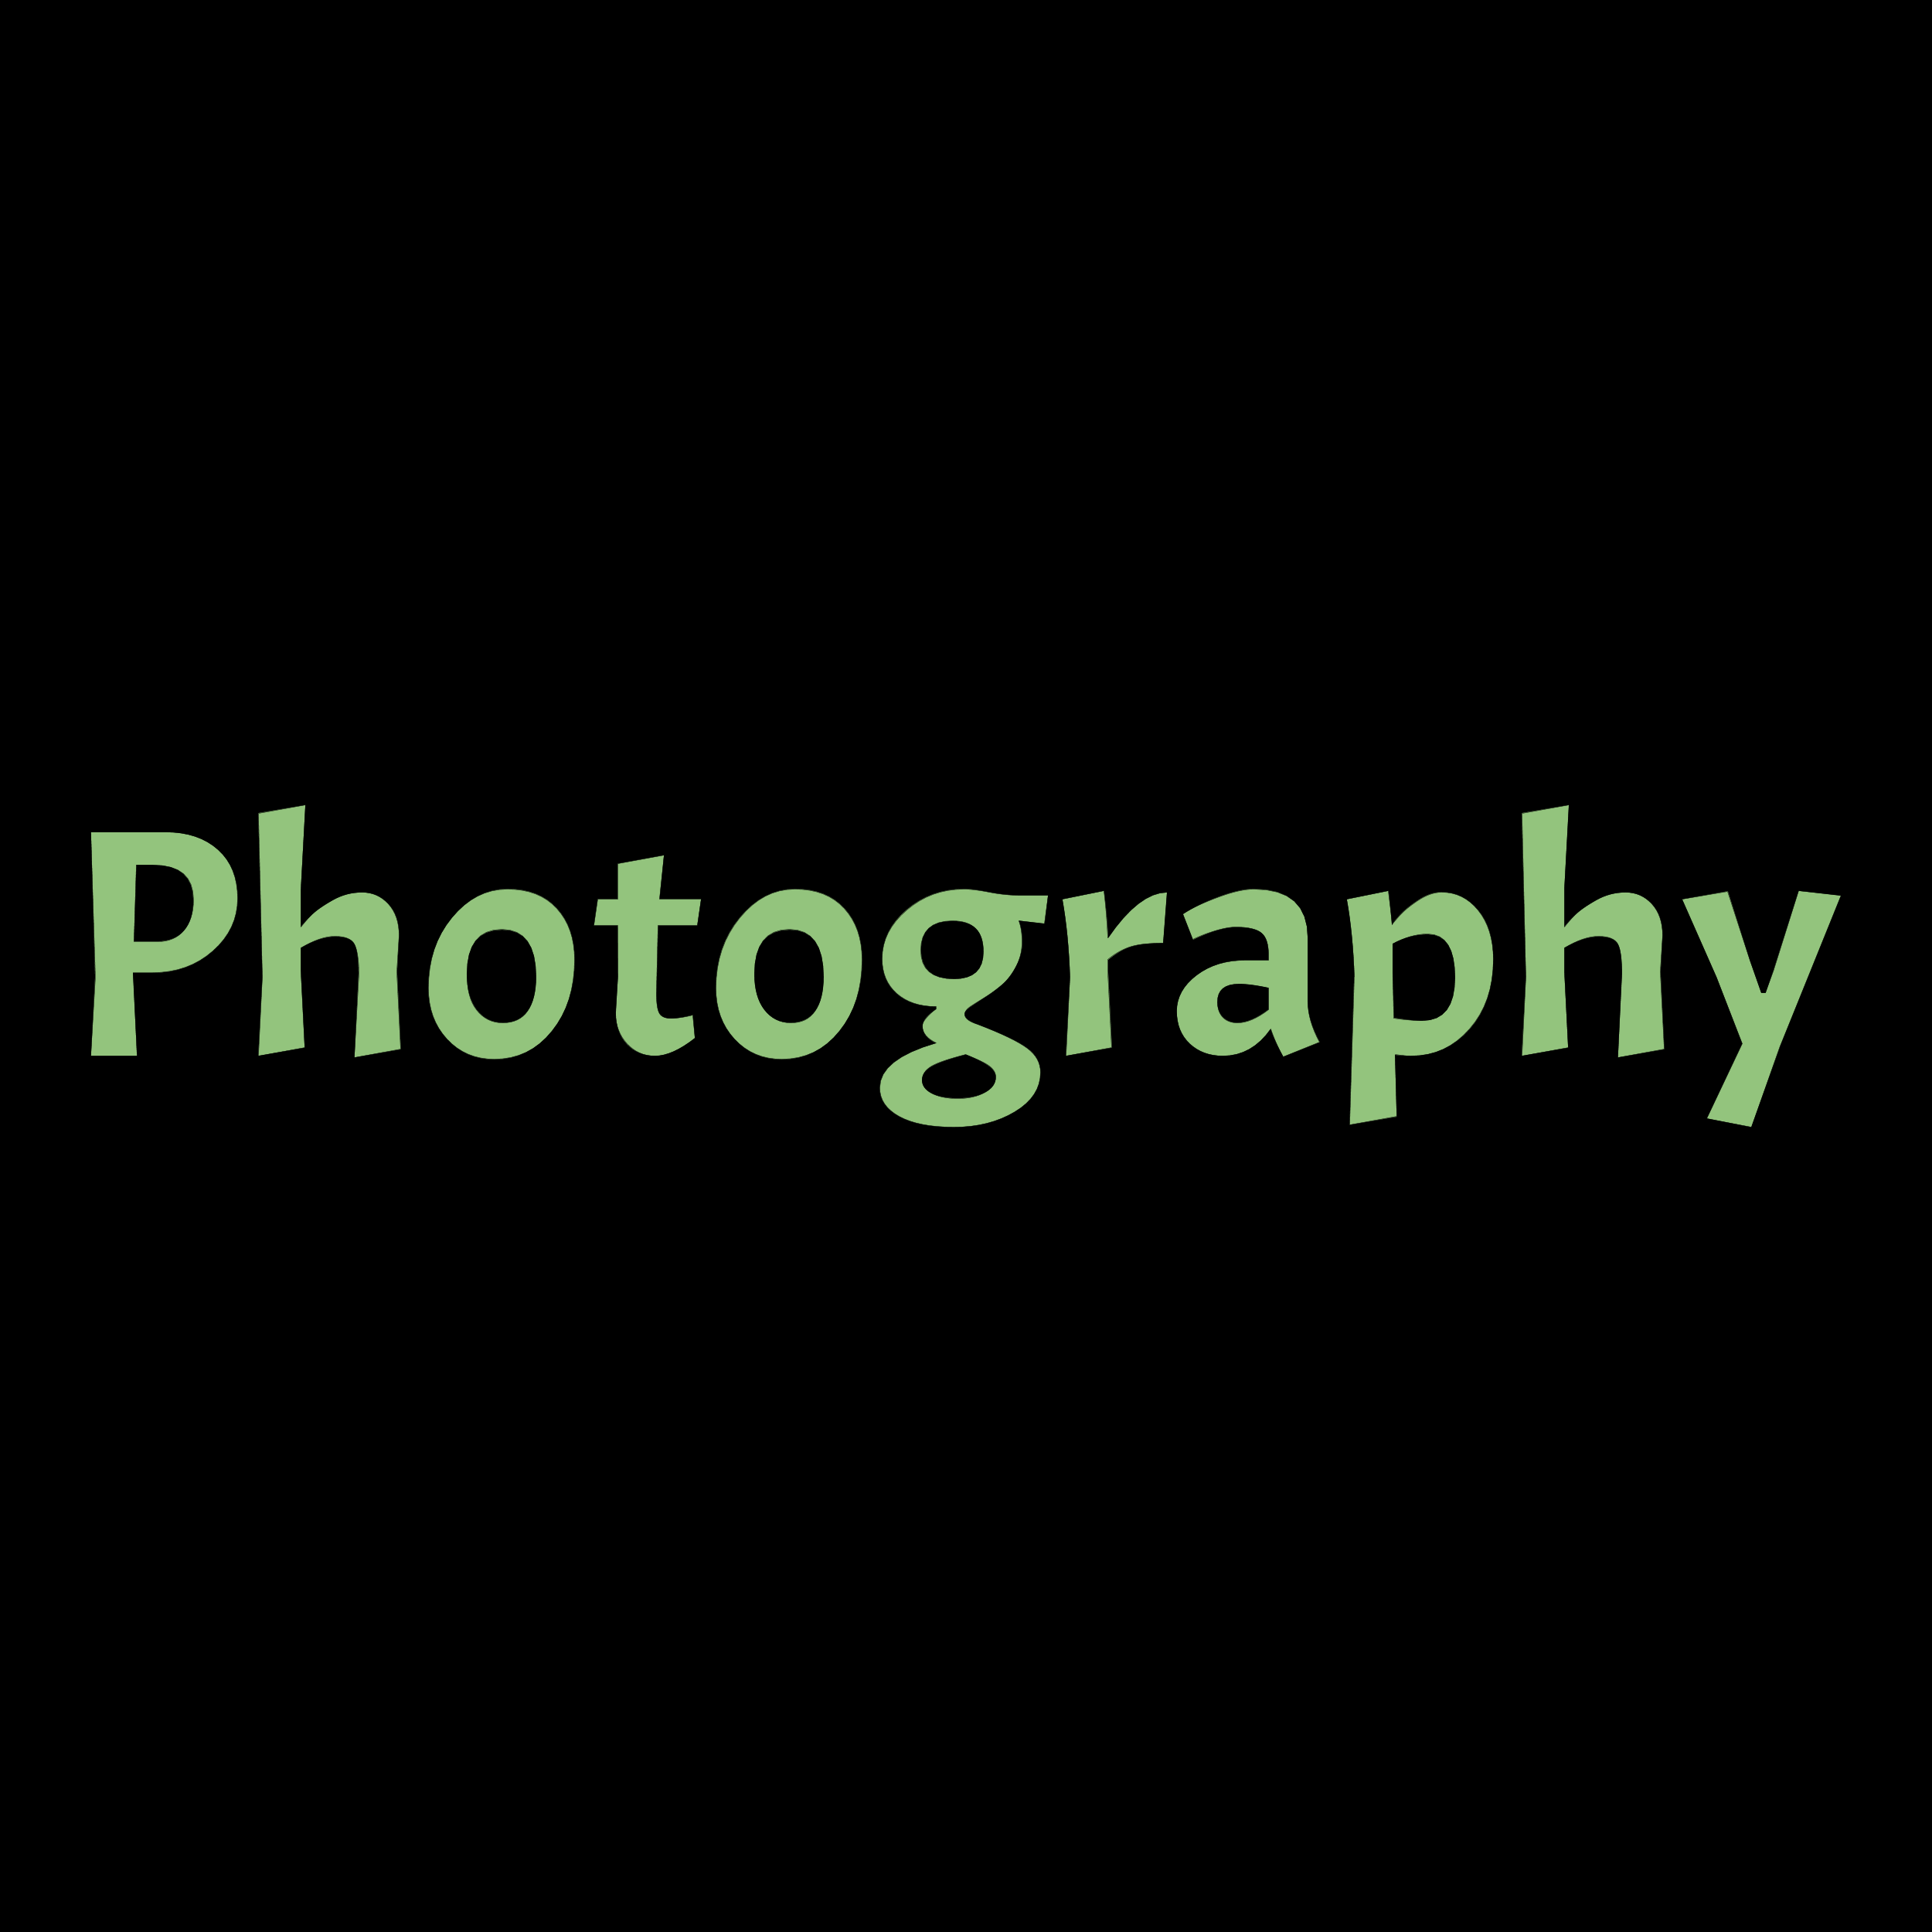 Photography 00006